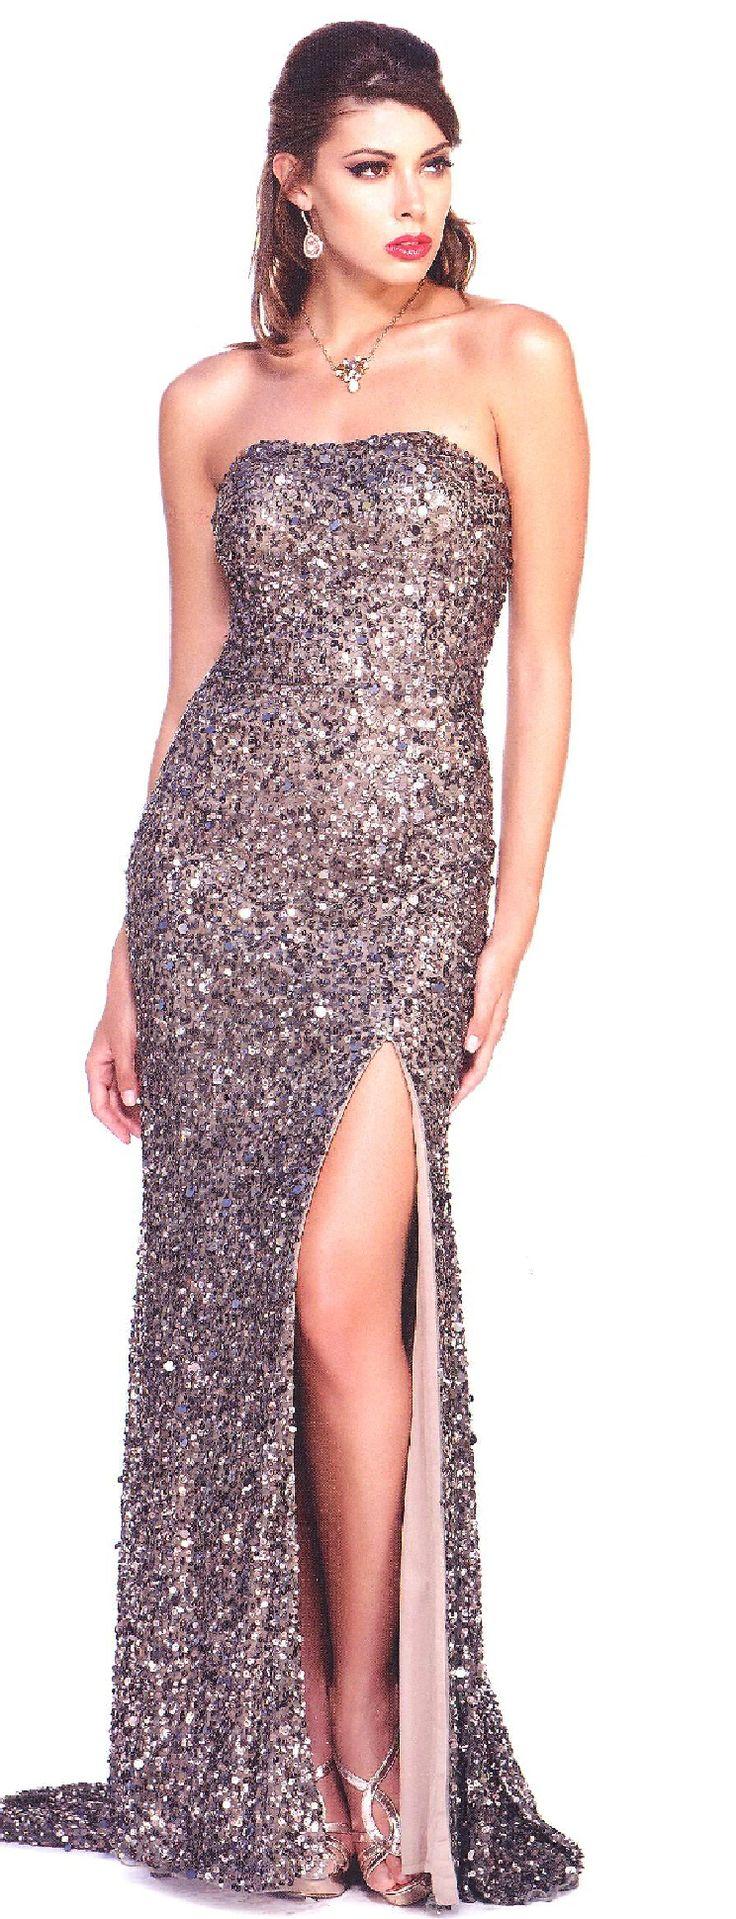 456 best SHAIL K. 2017 PROM Dresses, Evening Dresses, Sweet 16 ...